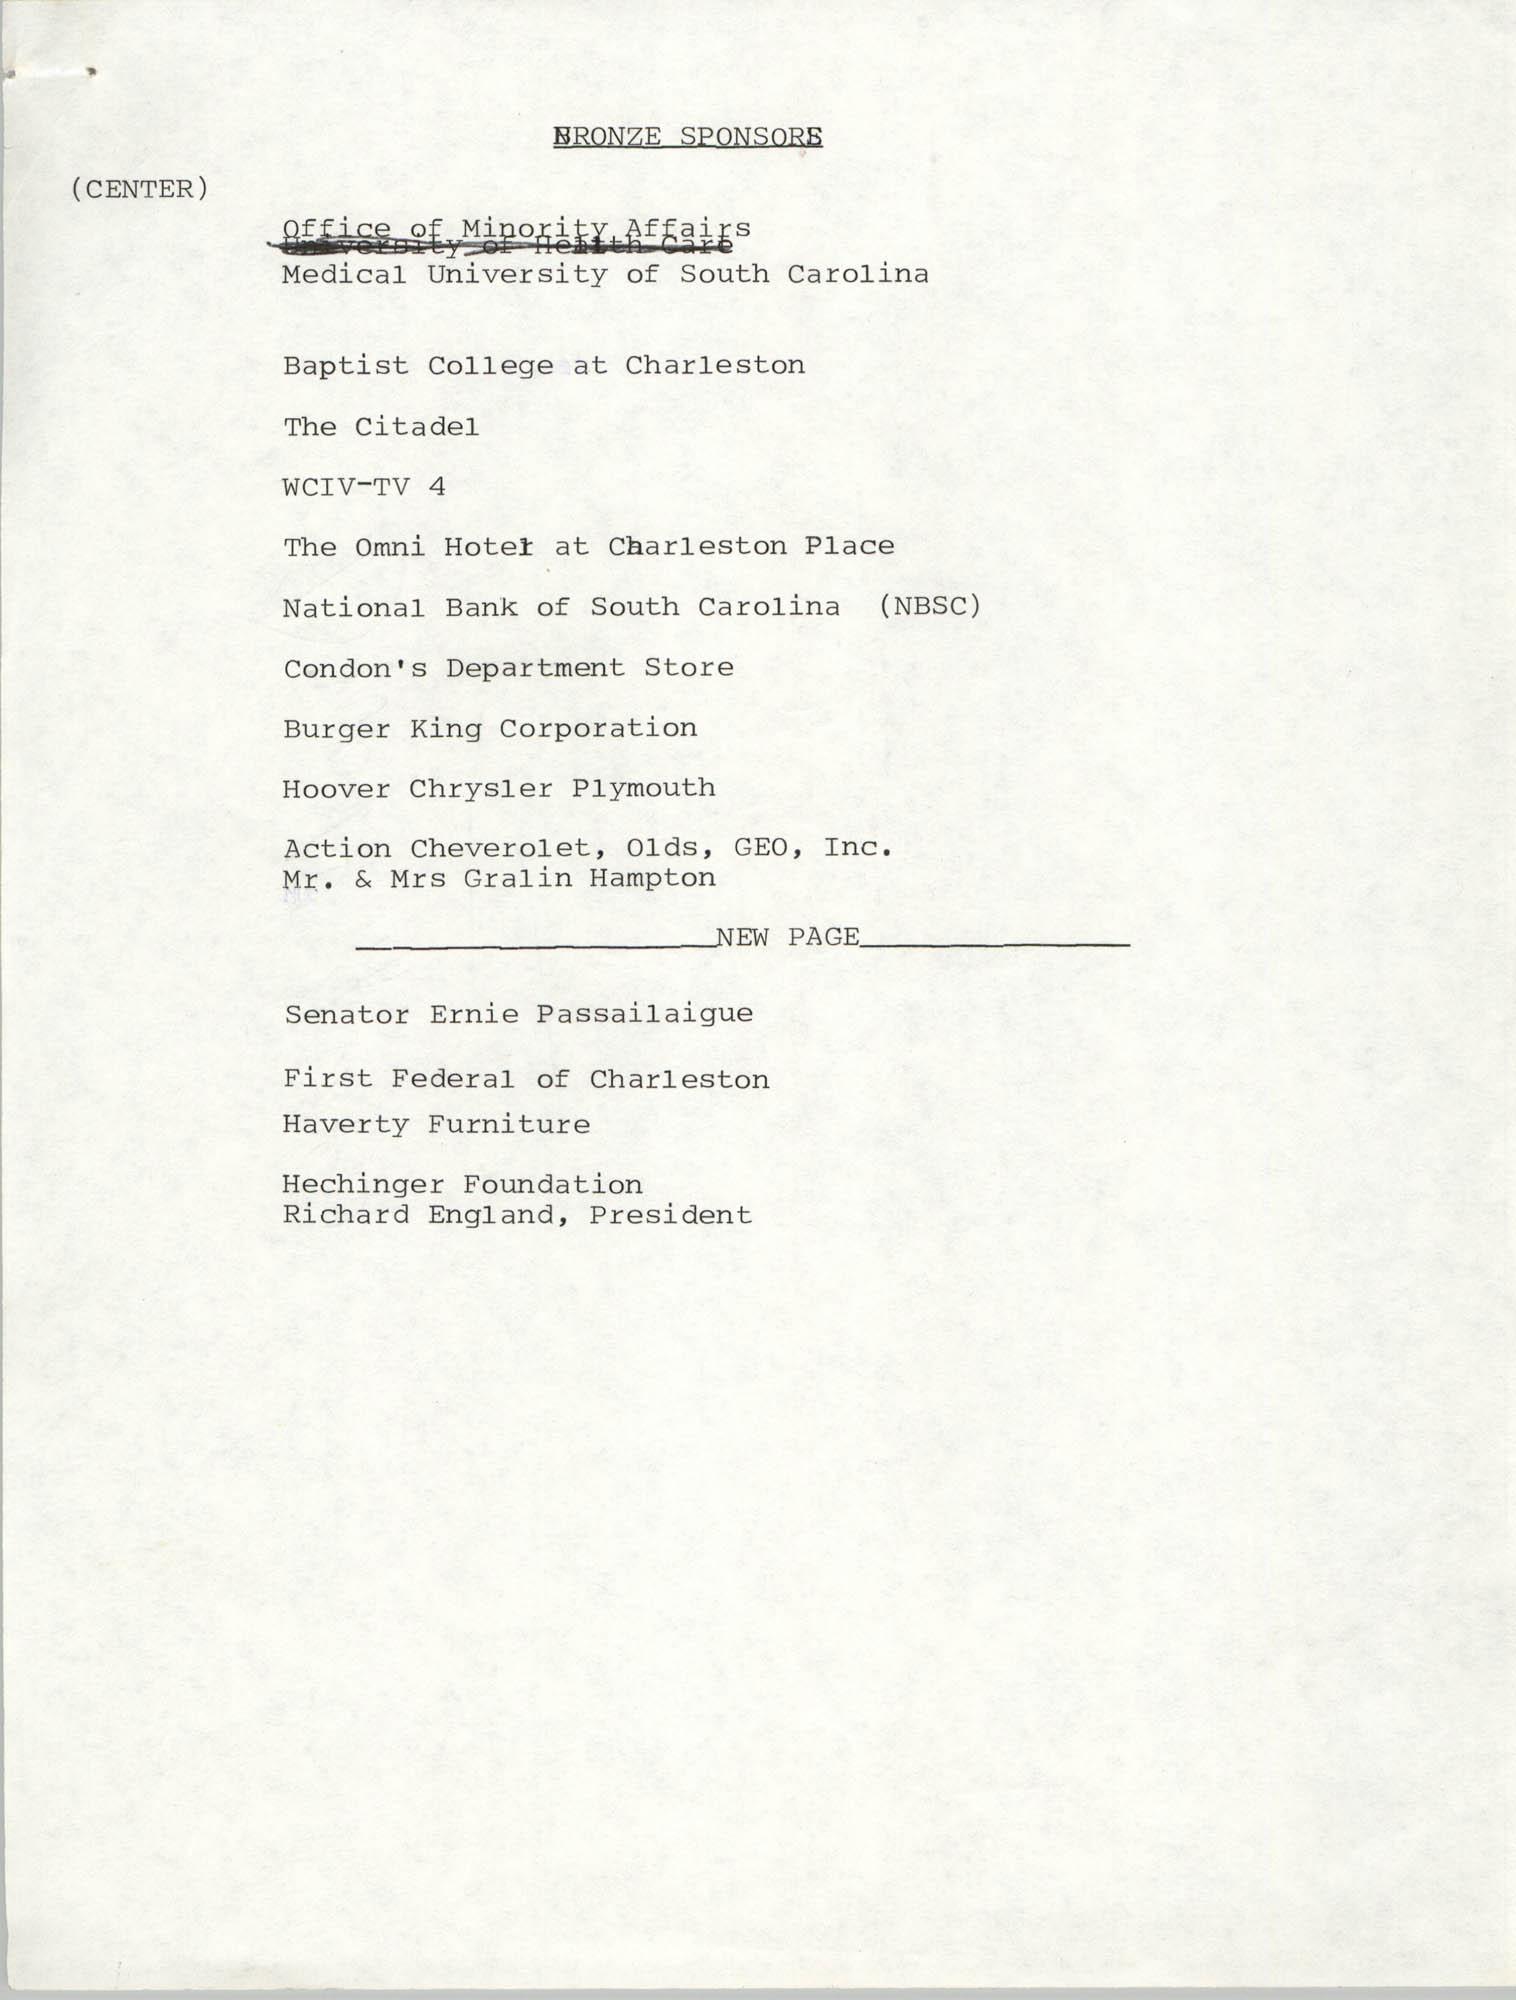 List of Bronze Sponsors